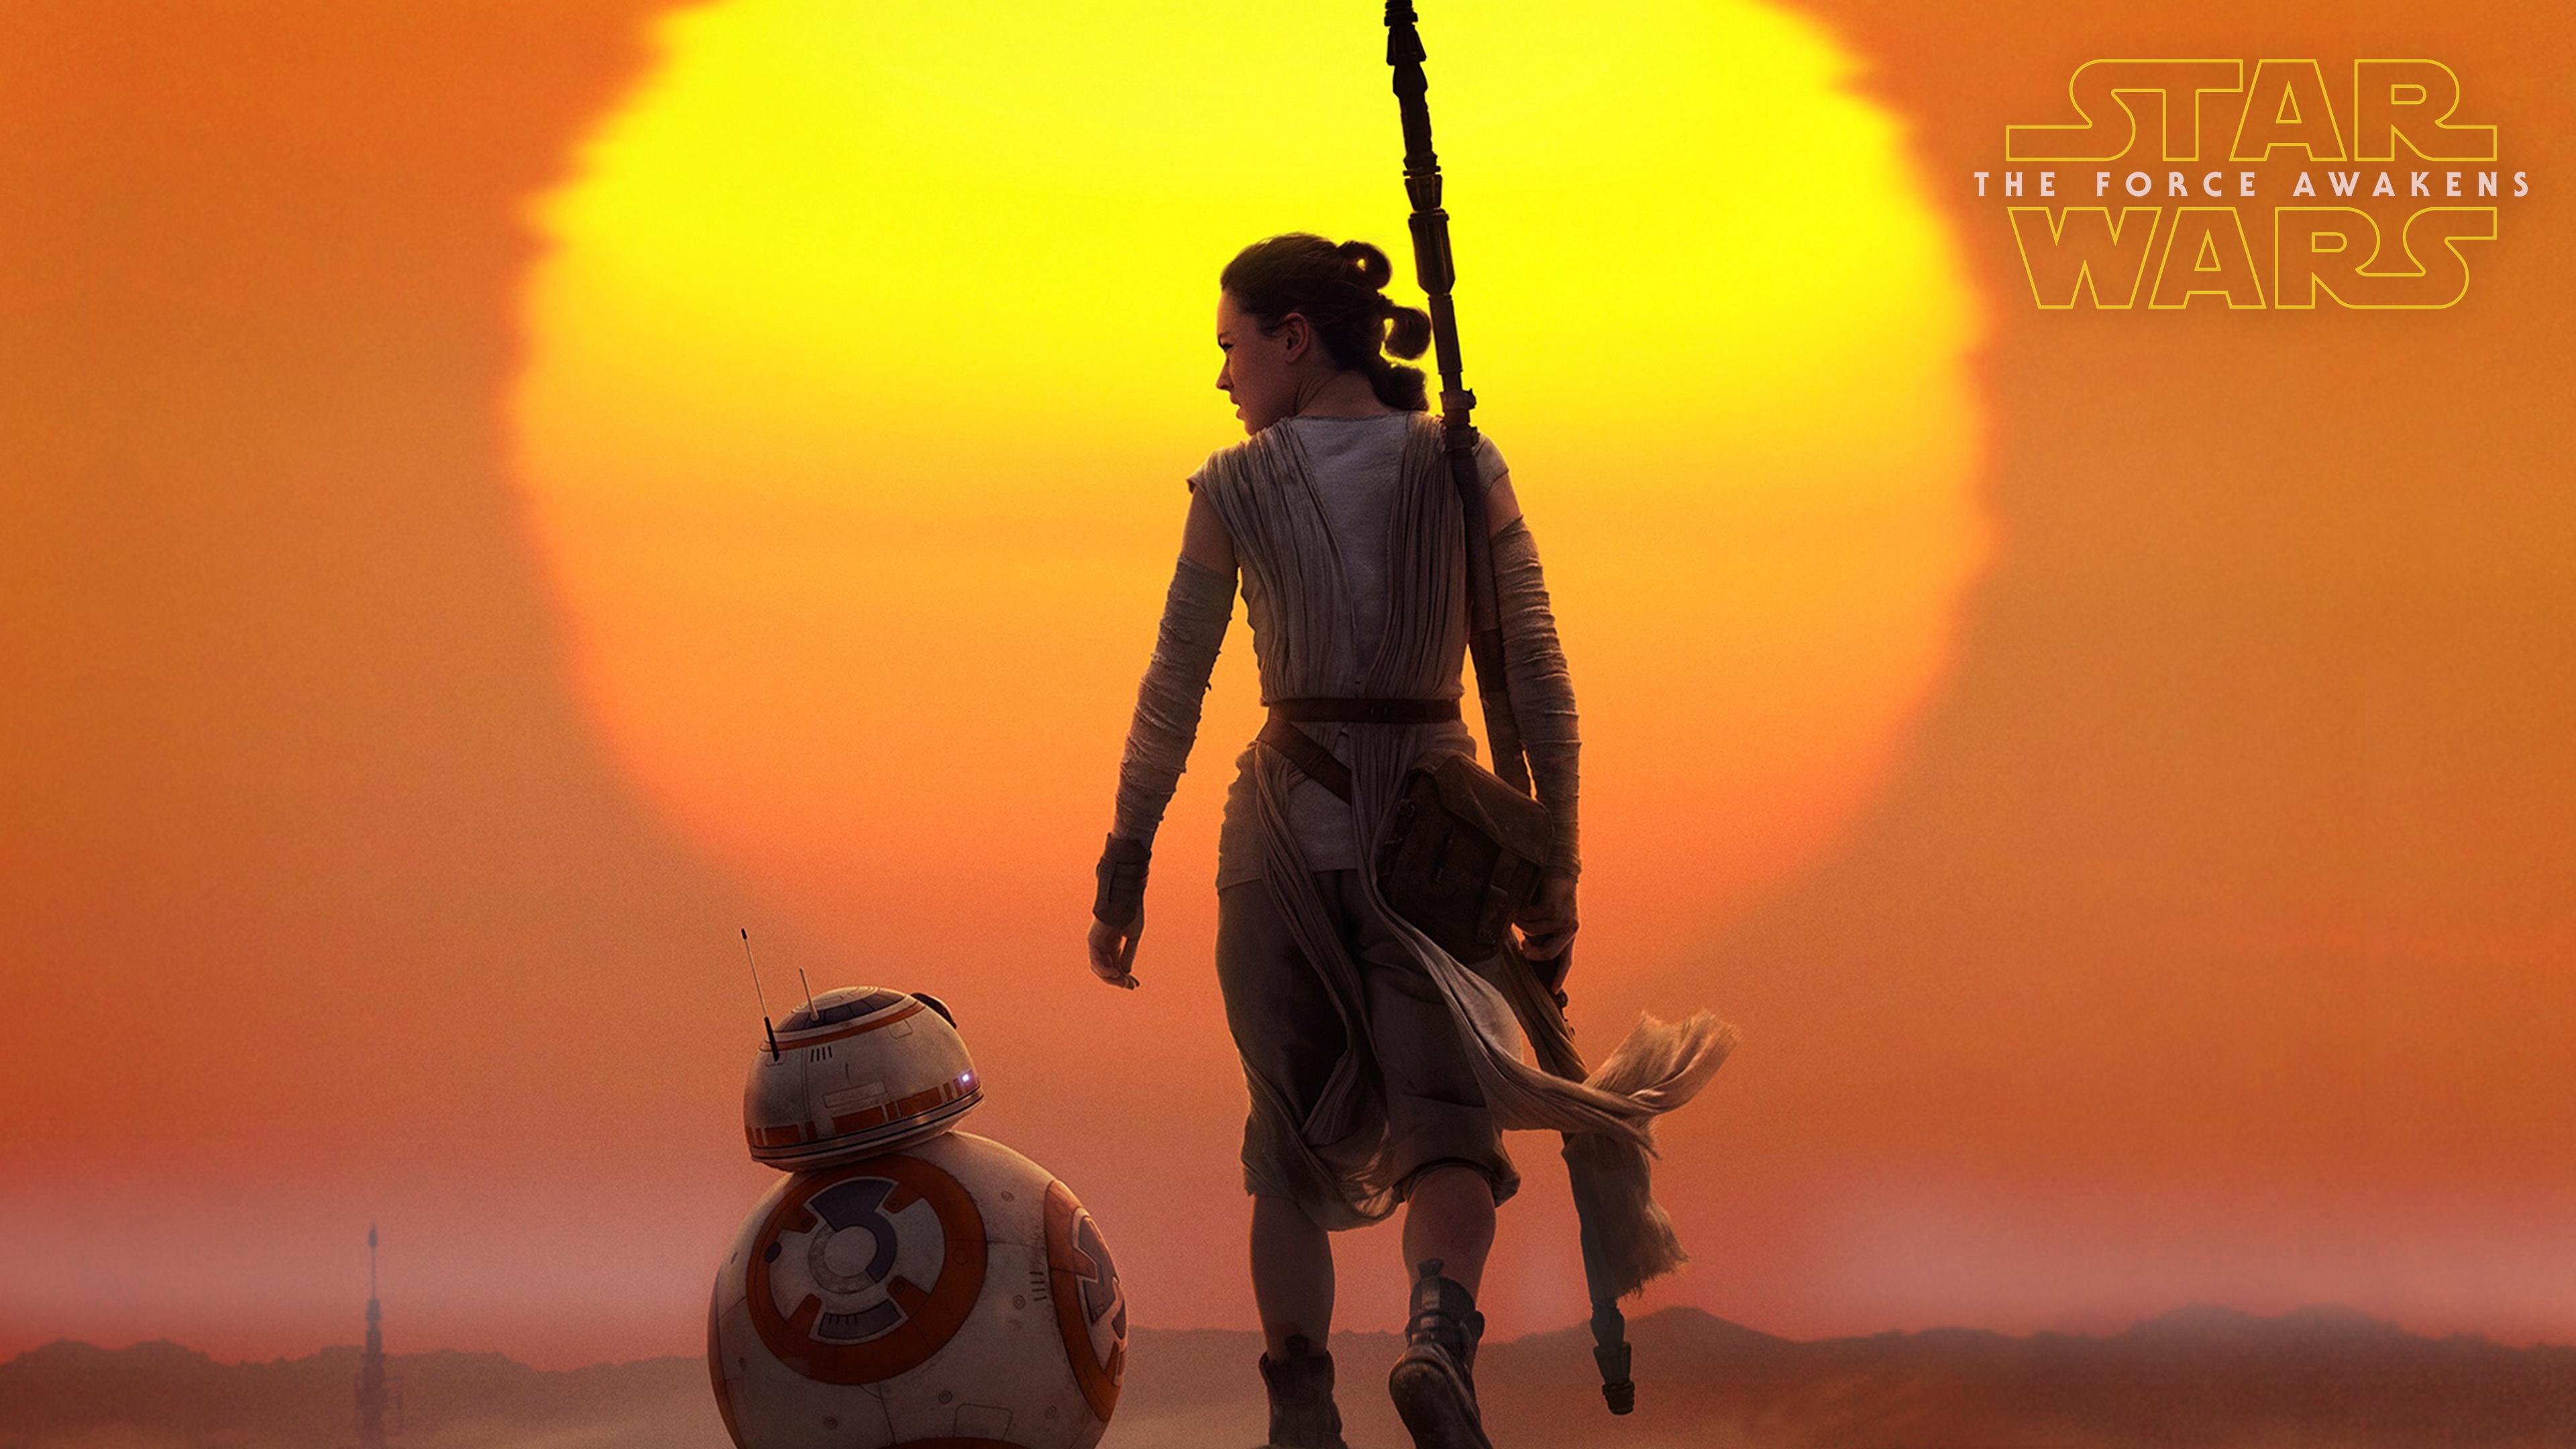 Star Wars The Force Awakens 4K Wallpaper.